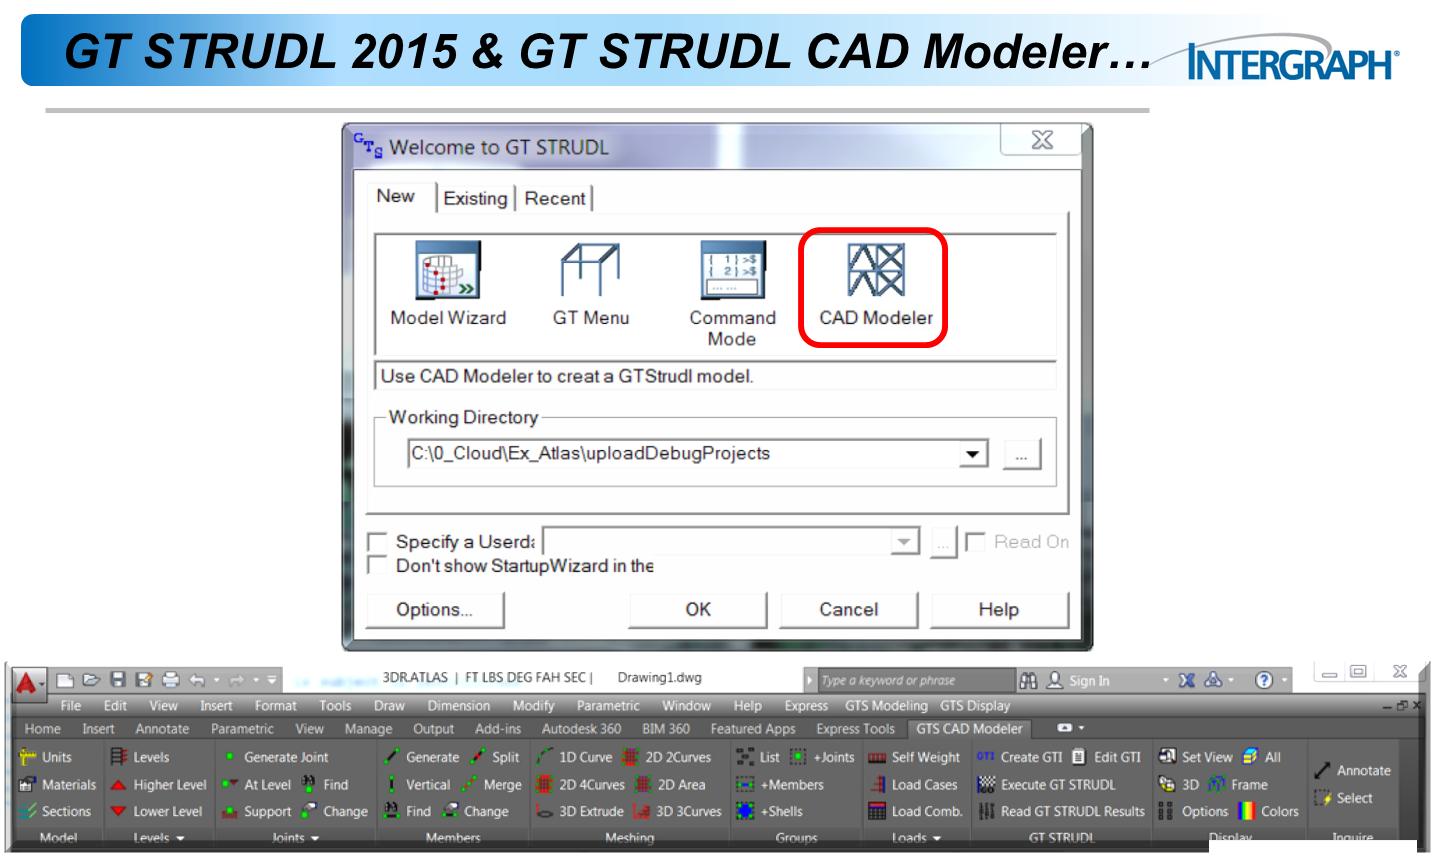 intergraph assets pdf GT STRUDL2